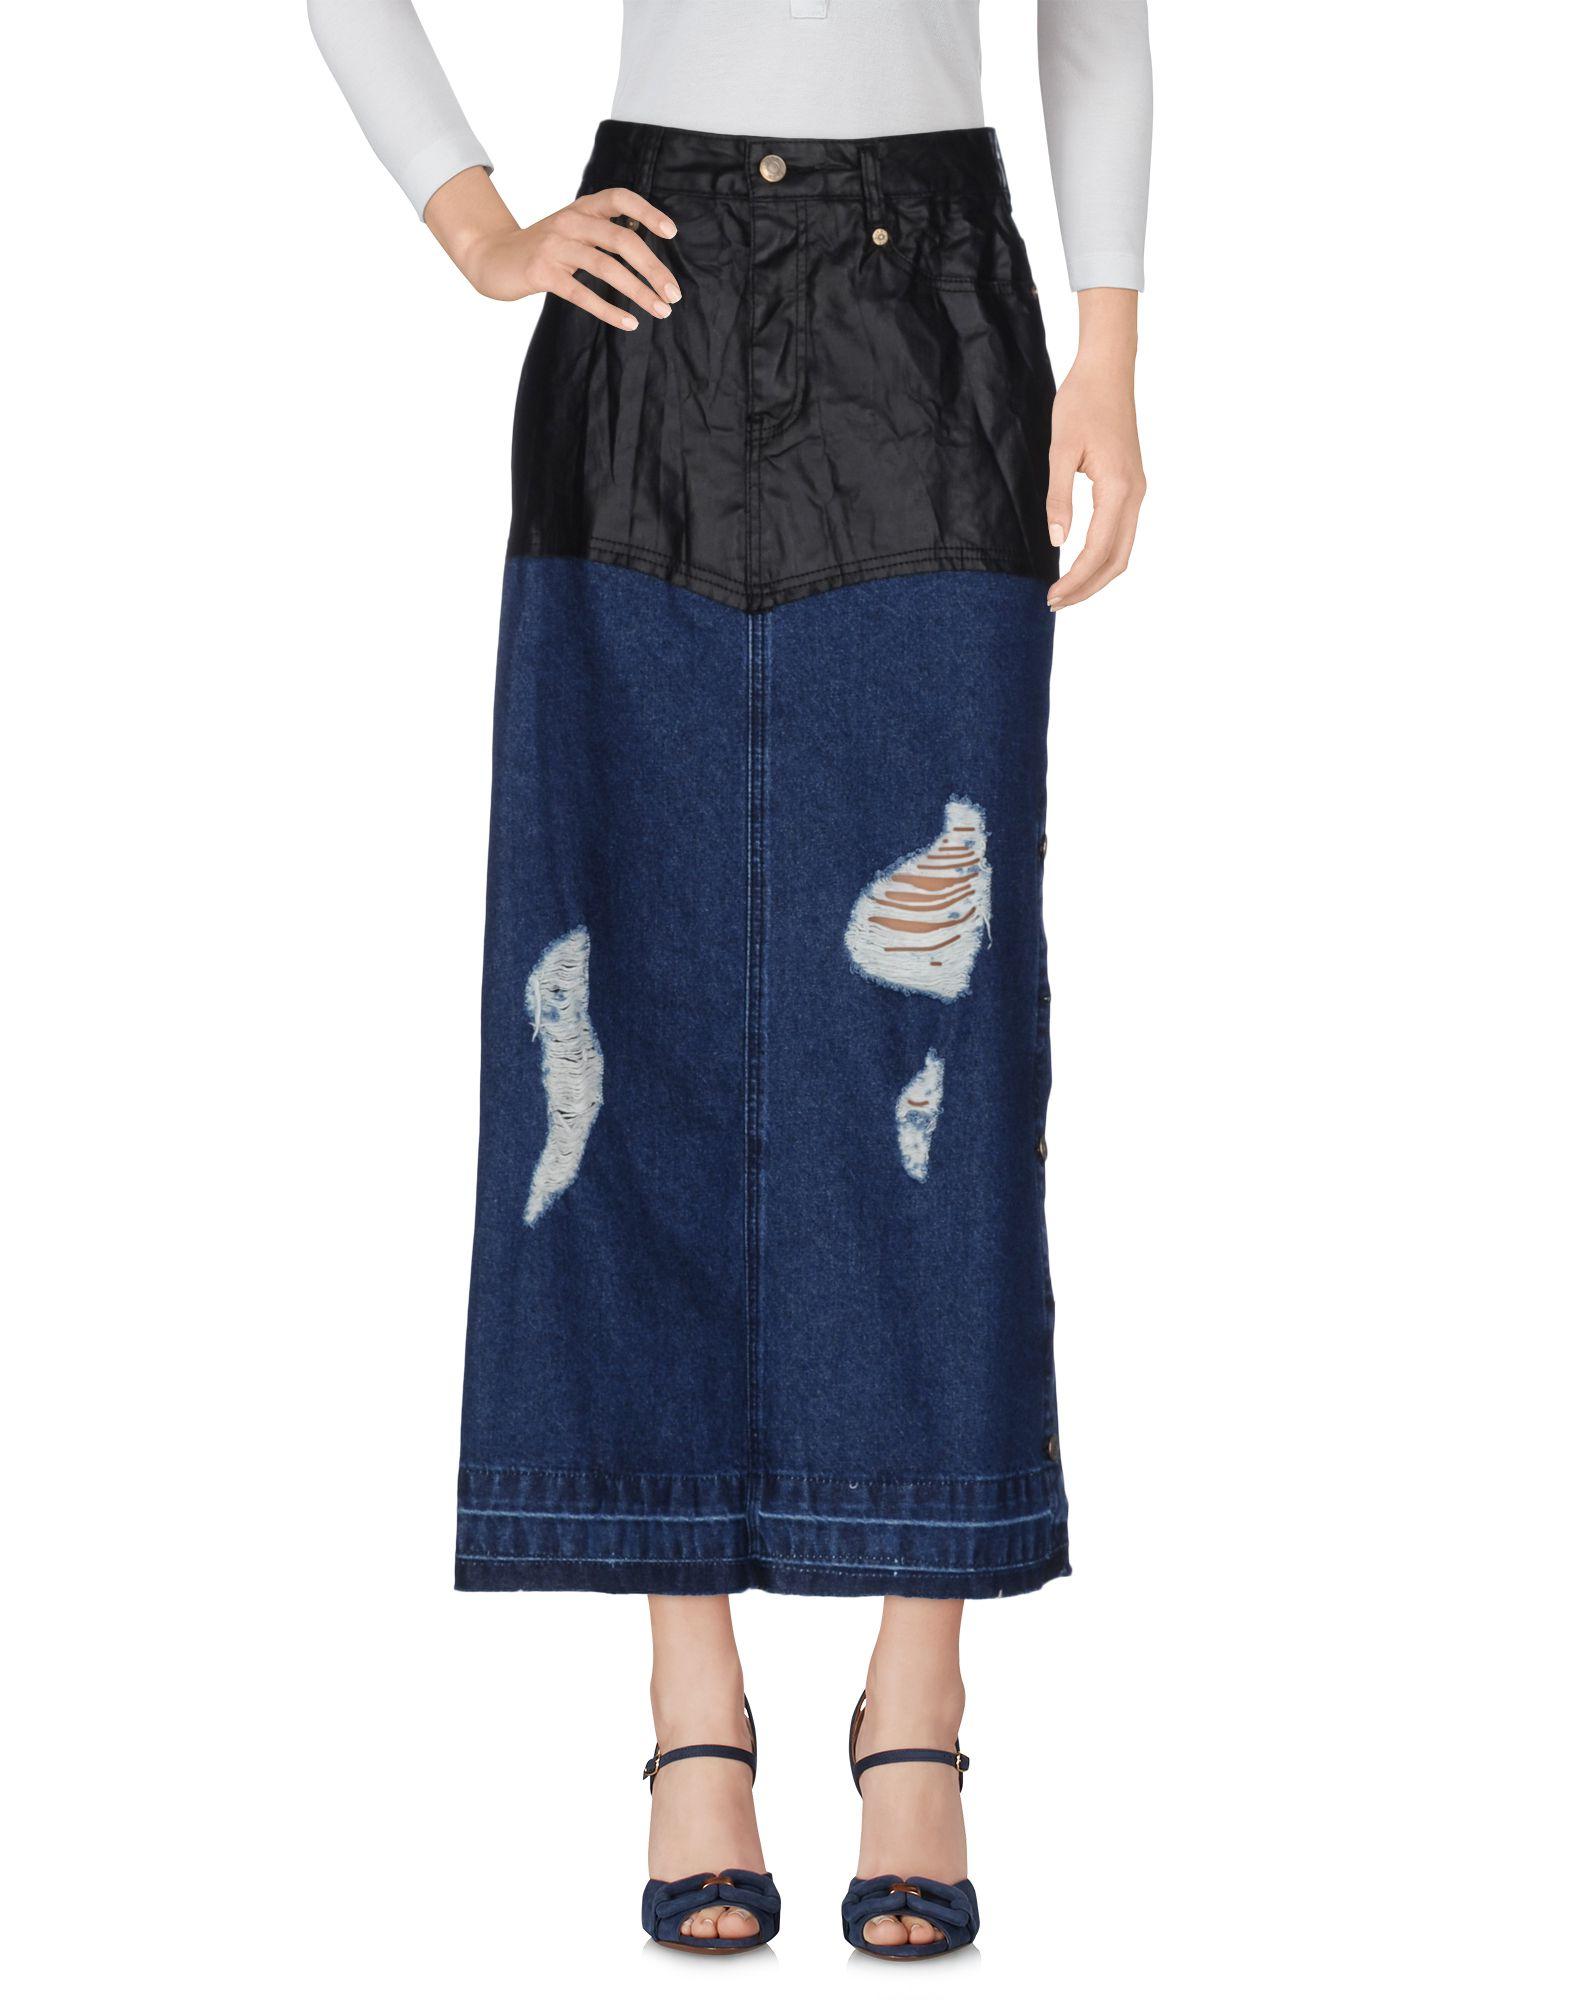 SJYP Damen Jeansrock Farbe Blau Größe 3 - broschei